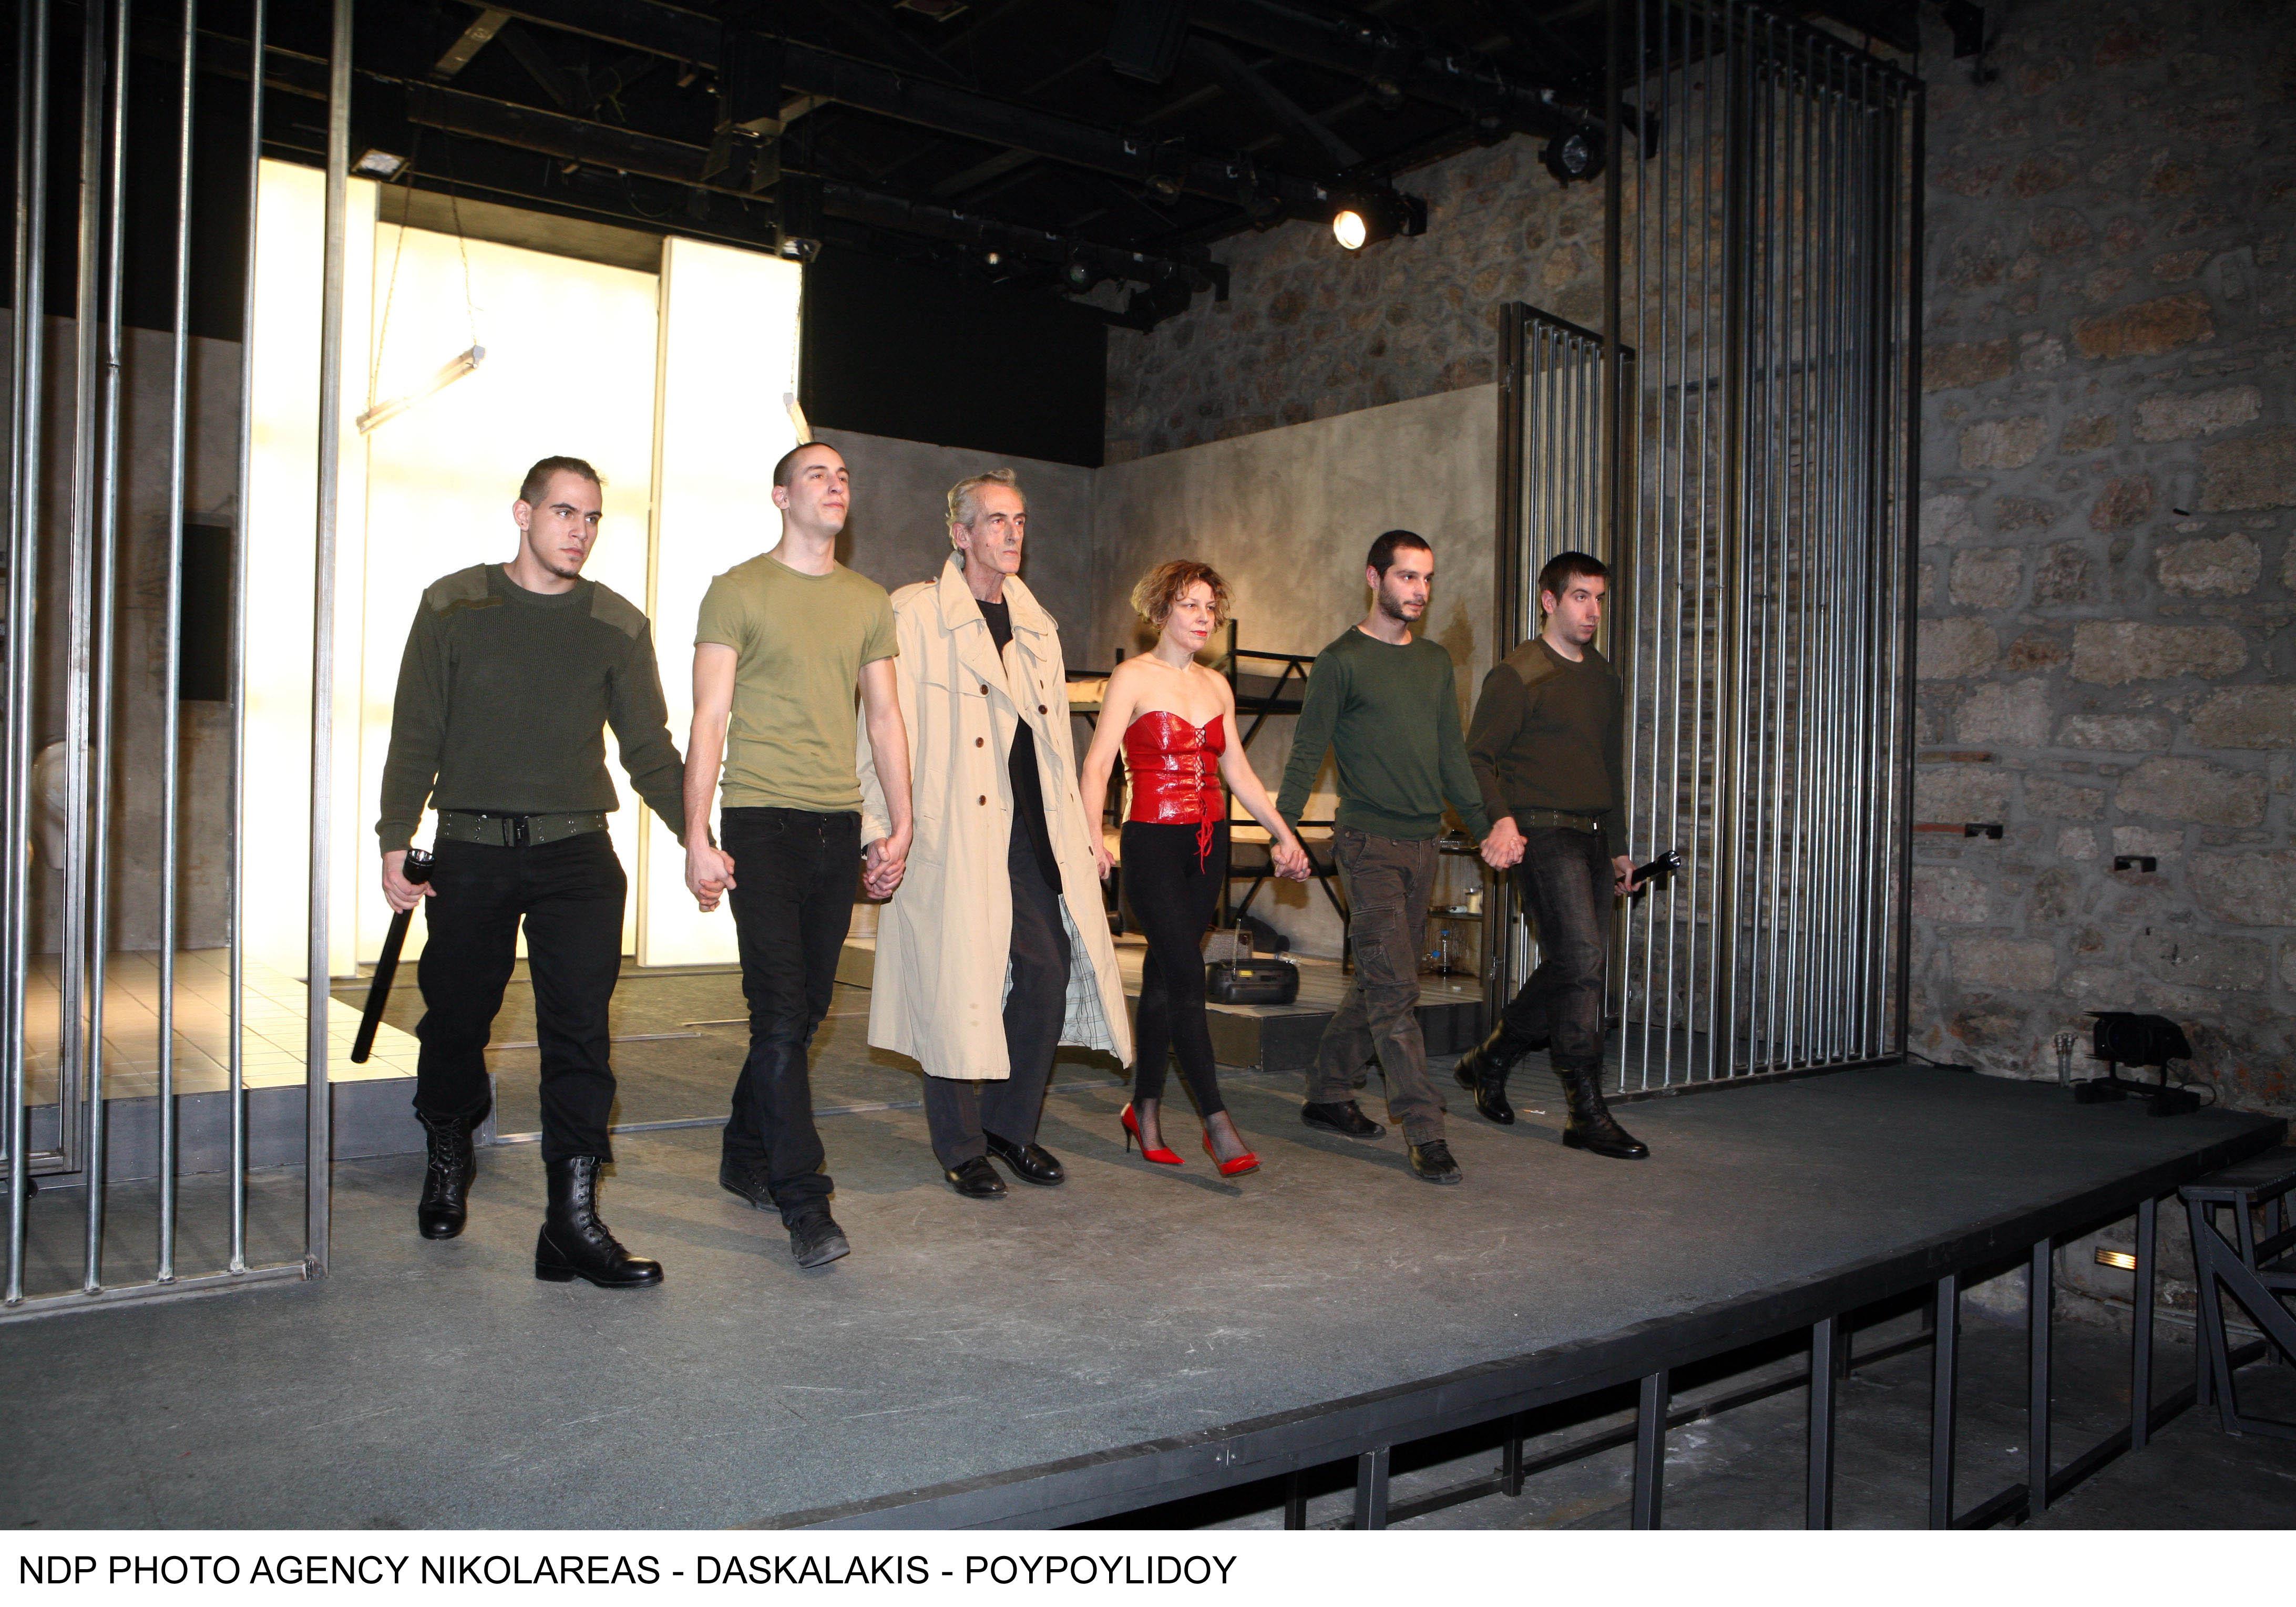 "O Τάκης Μοσχος στην πρεμιέρα της σειρά «Το 99%""» του Άρη Δαβαράκη στο θέατρο Χυτήριο το 2008."